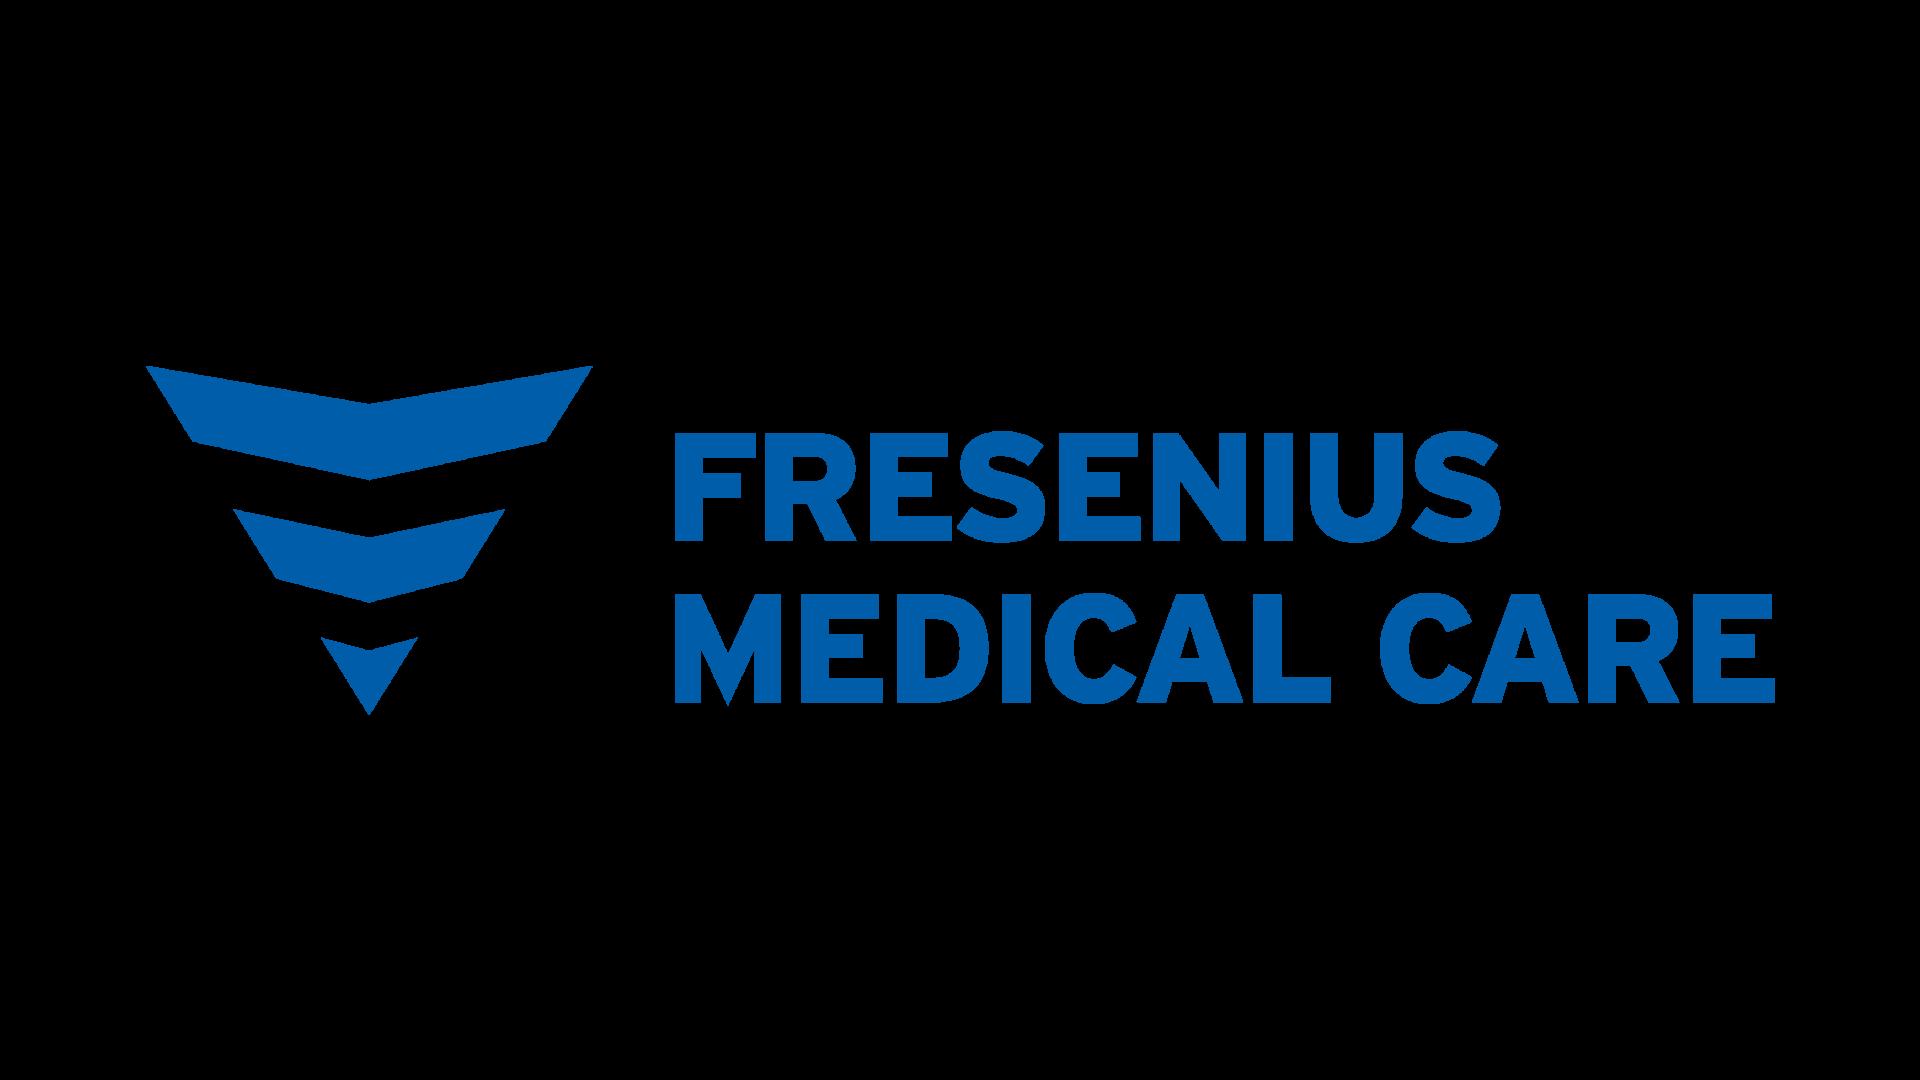 Fresnius Medical Care